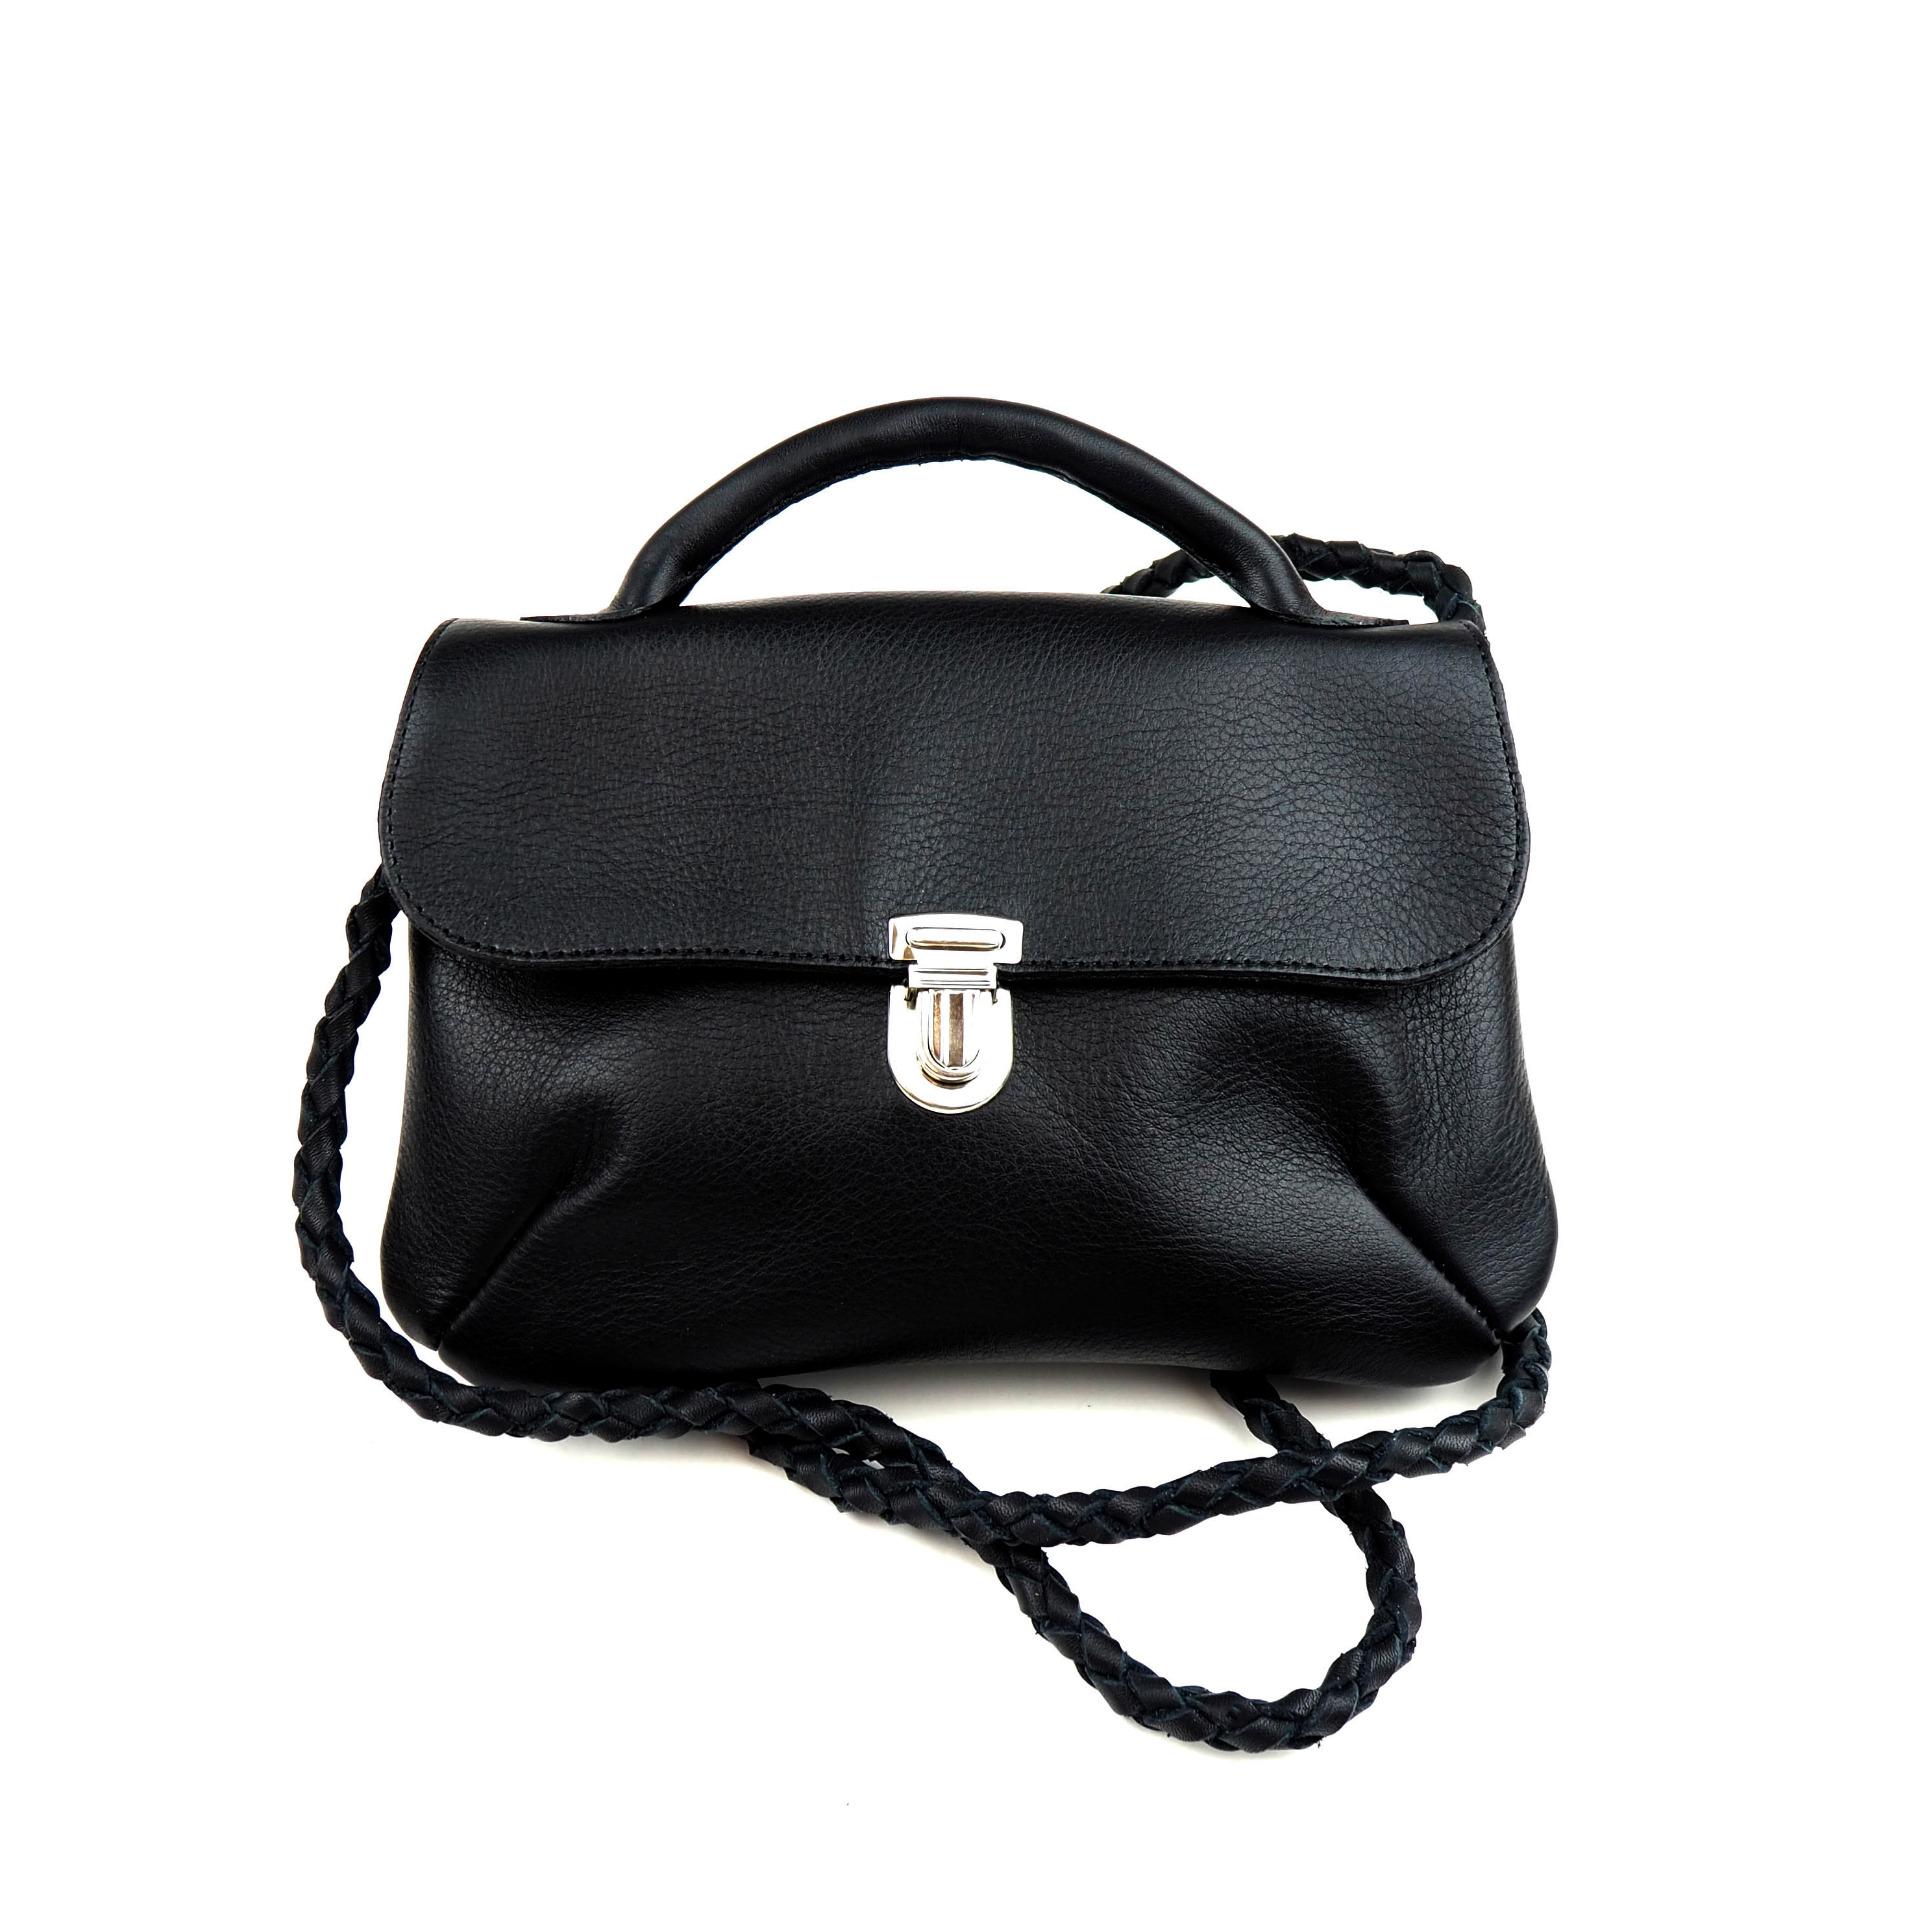 Musta London-laukku - Cobblerina